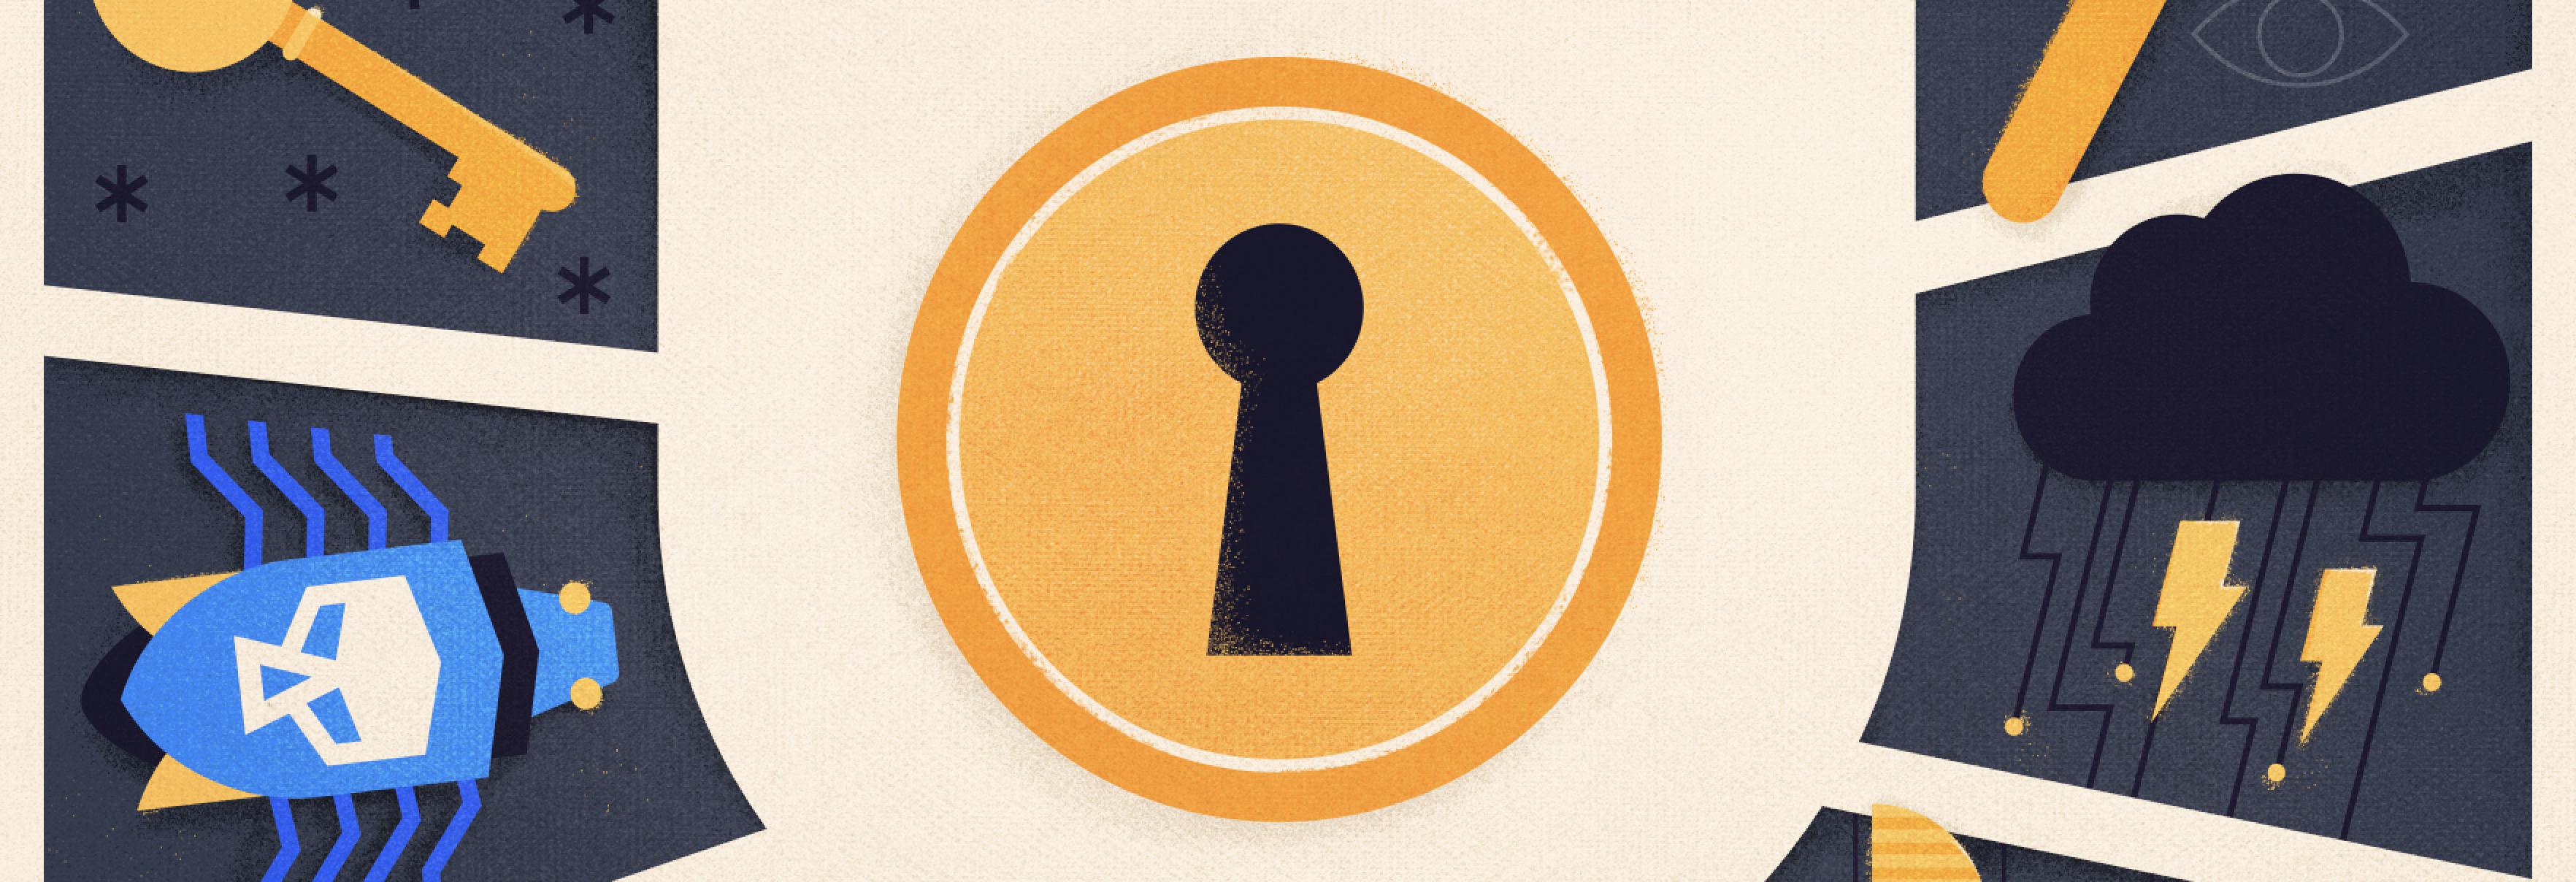 Illustration of data privacy separator 03